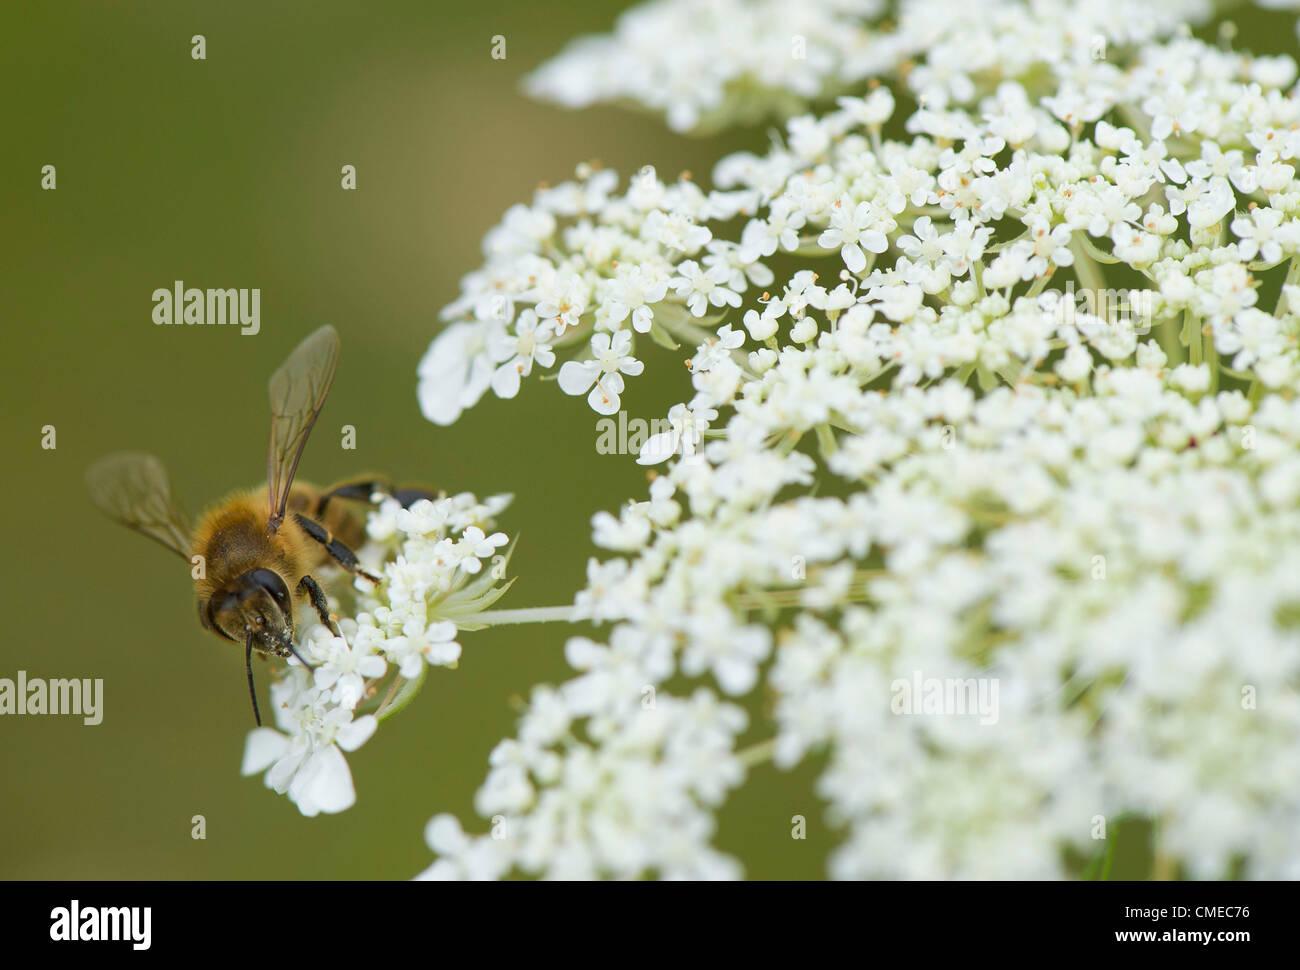 July 29 2012 Roseburg Oregon U S A Honey Bee Feeds On A Queen